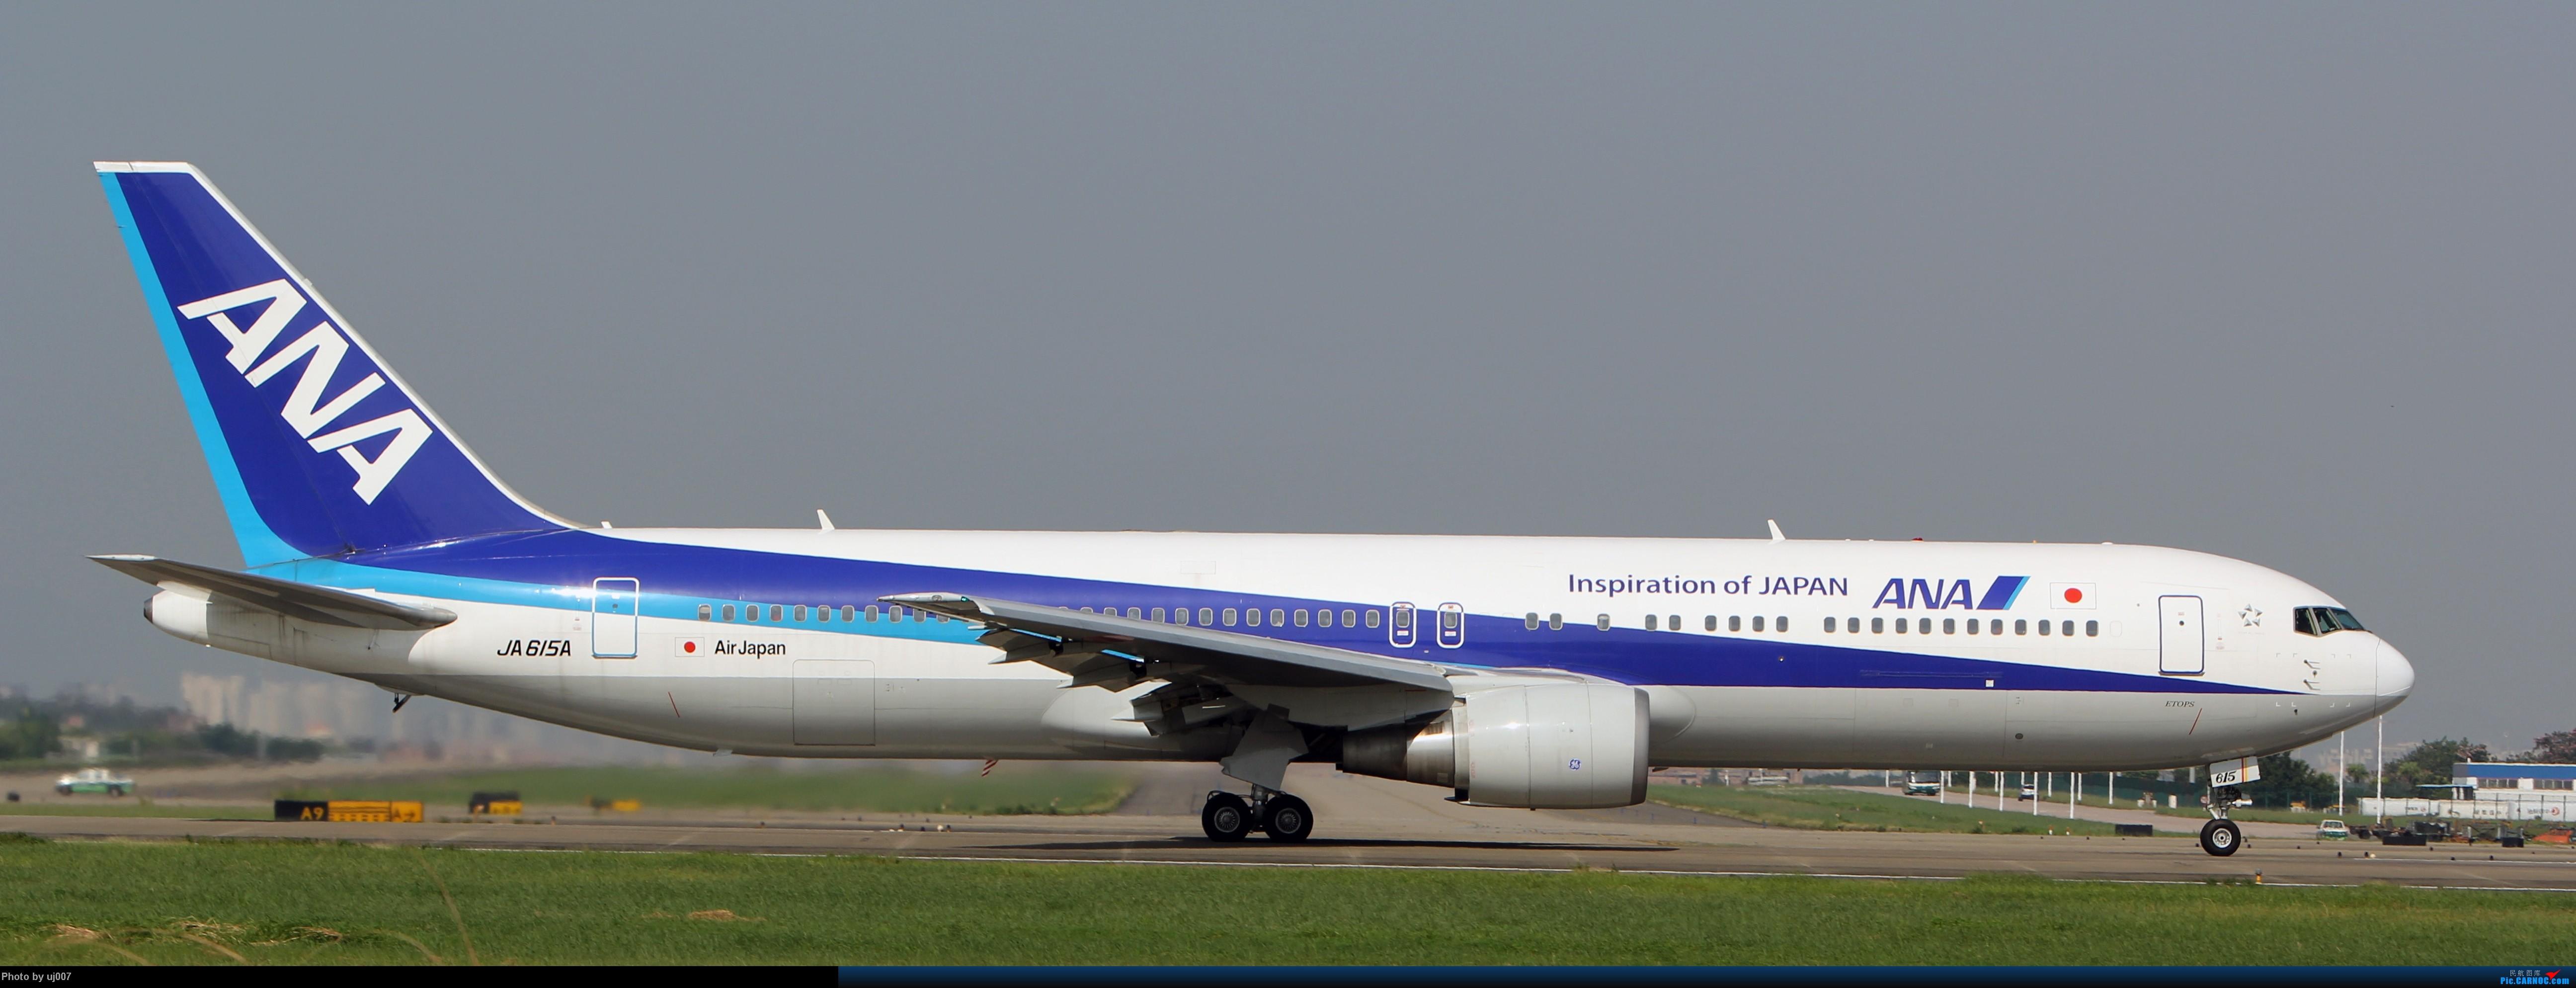 Re:[原创]10月2日白云拍机(大飞机,特别妆,外航,闪灯,擦烟)求指点. BOEING 767-300 JA615A 广州白云国际机场